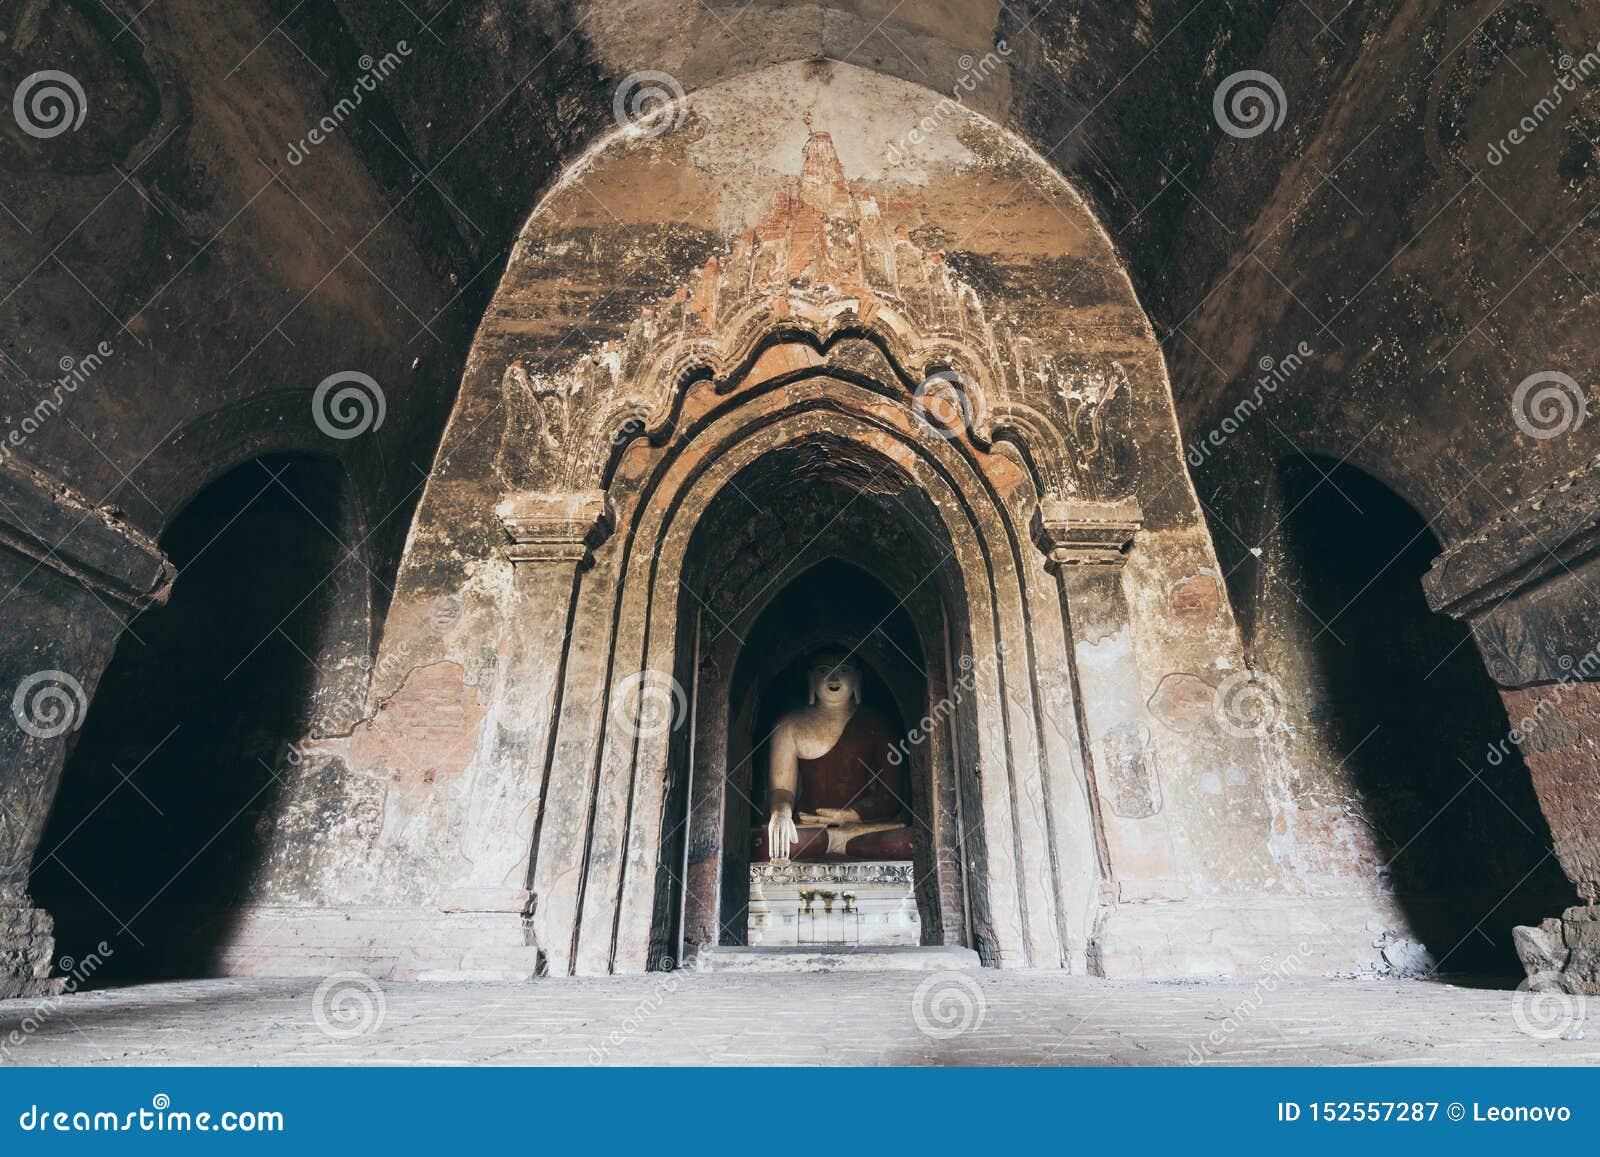 Interior of Burmese Buddhist temple in Bagan, Myanmar